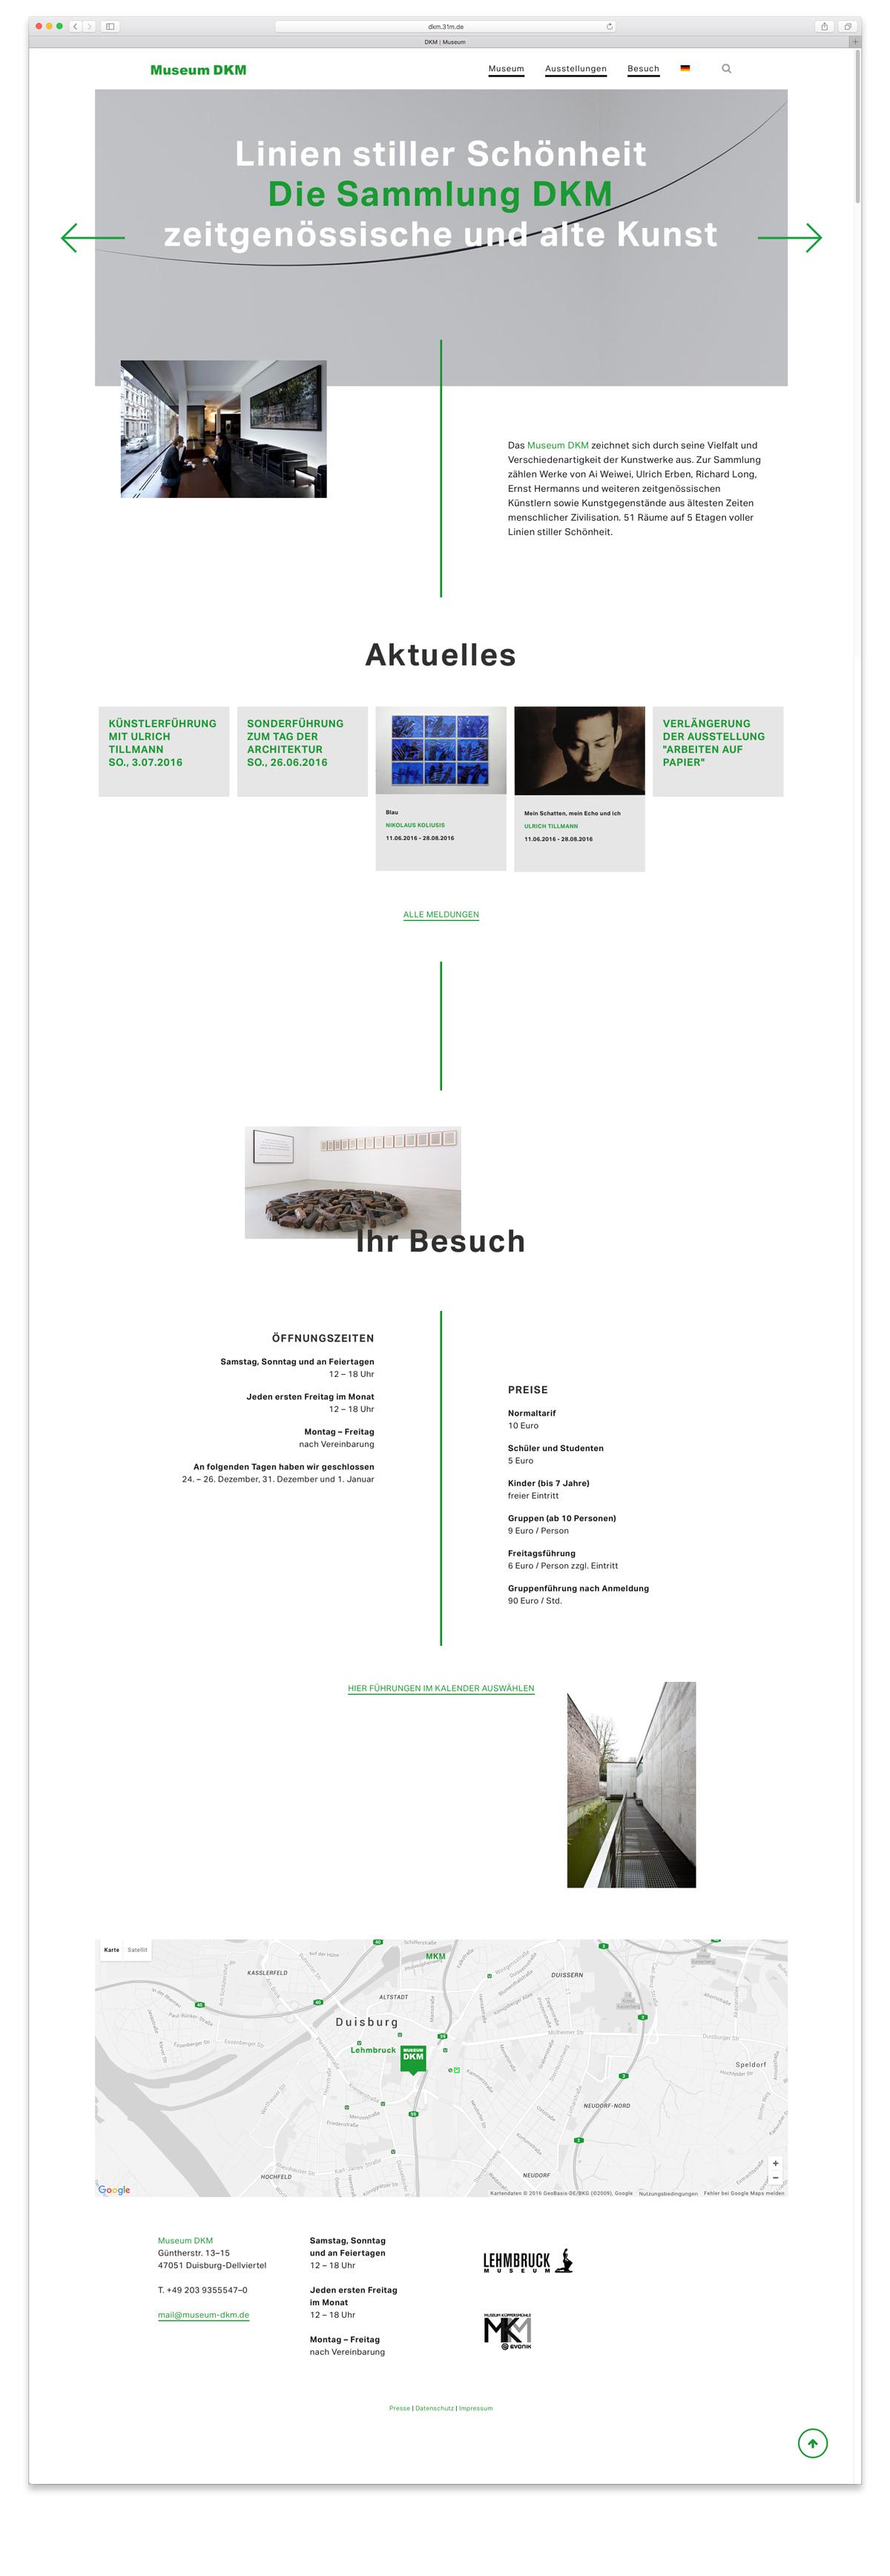 MUSEUM-DKM-FULLPAGE-1